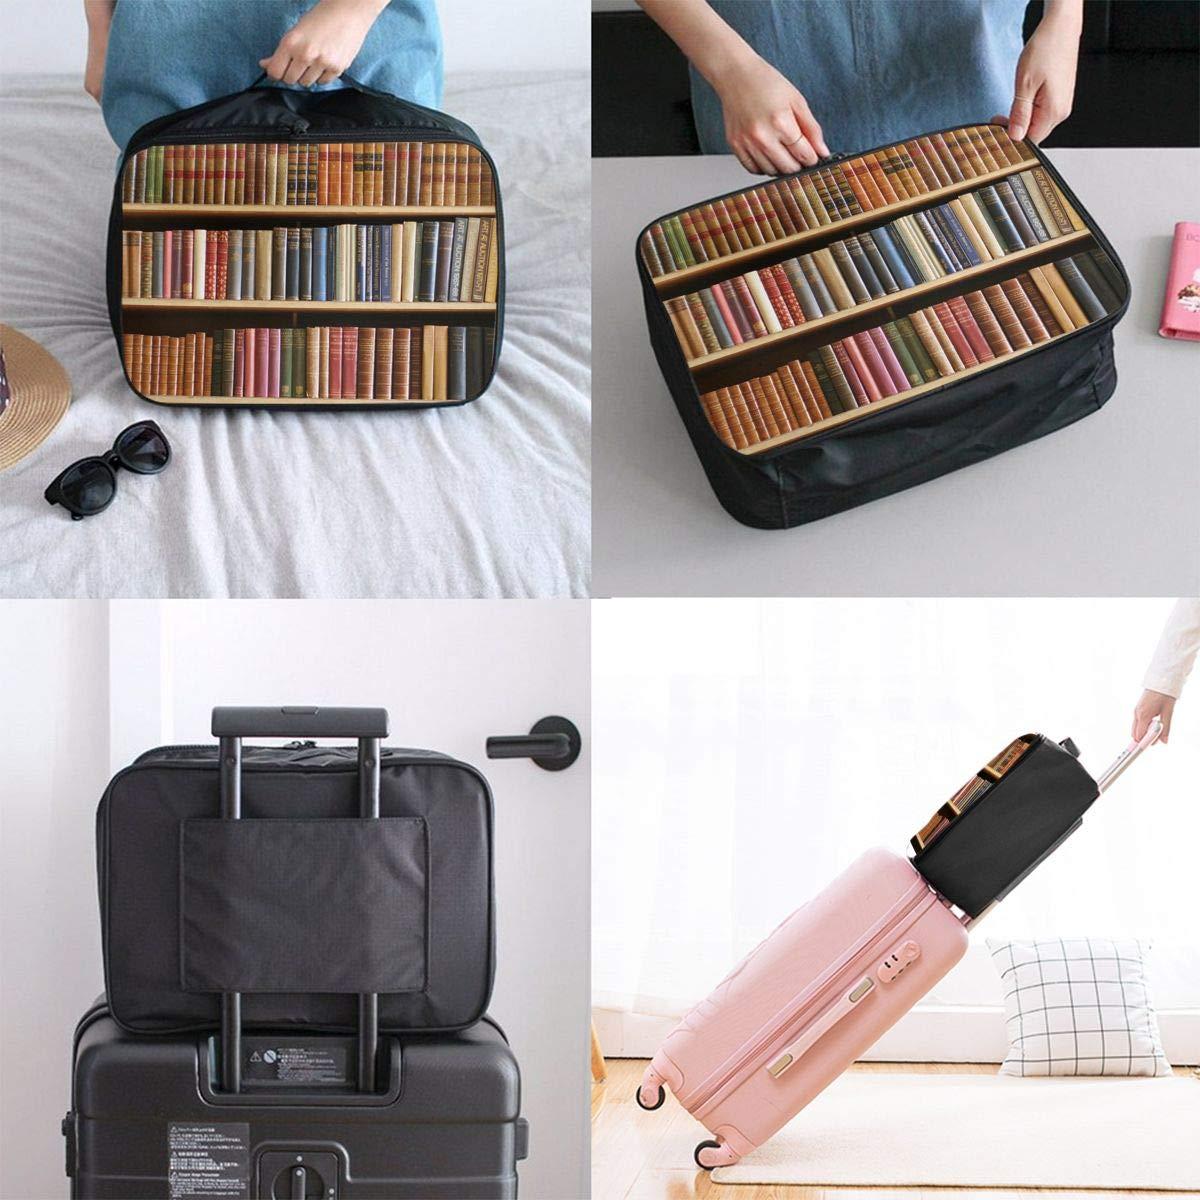 YueLJB Rich Bookshelf Lightweight Large Capacity Portable Luggage Bag Travel Duffel Bag Storage Carry Luggage Duffle Tote Bag